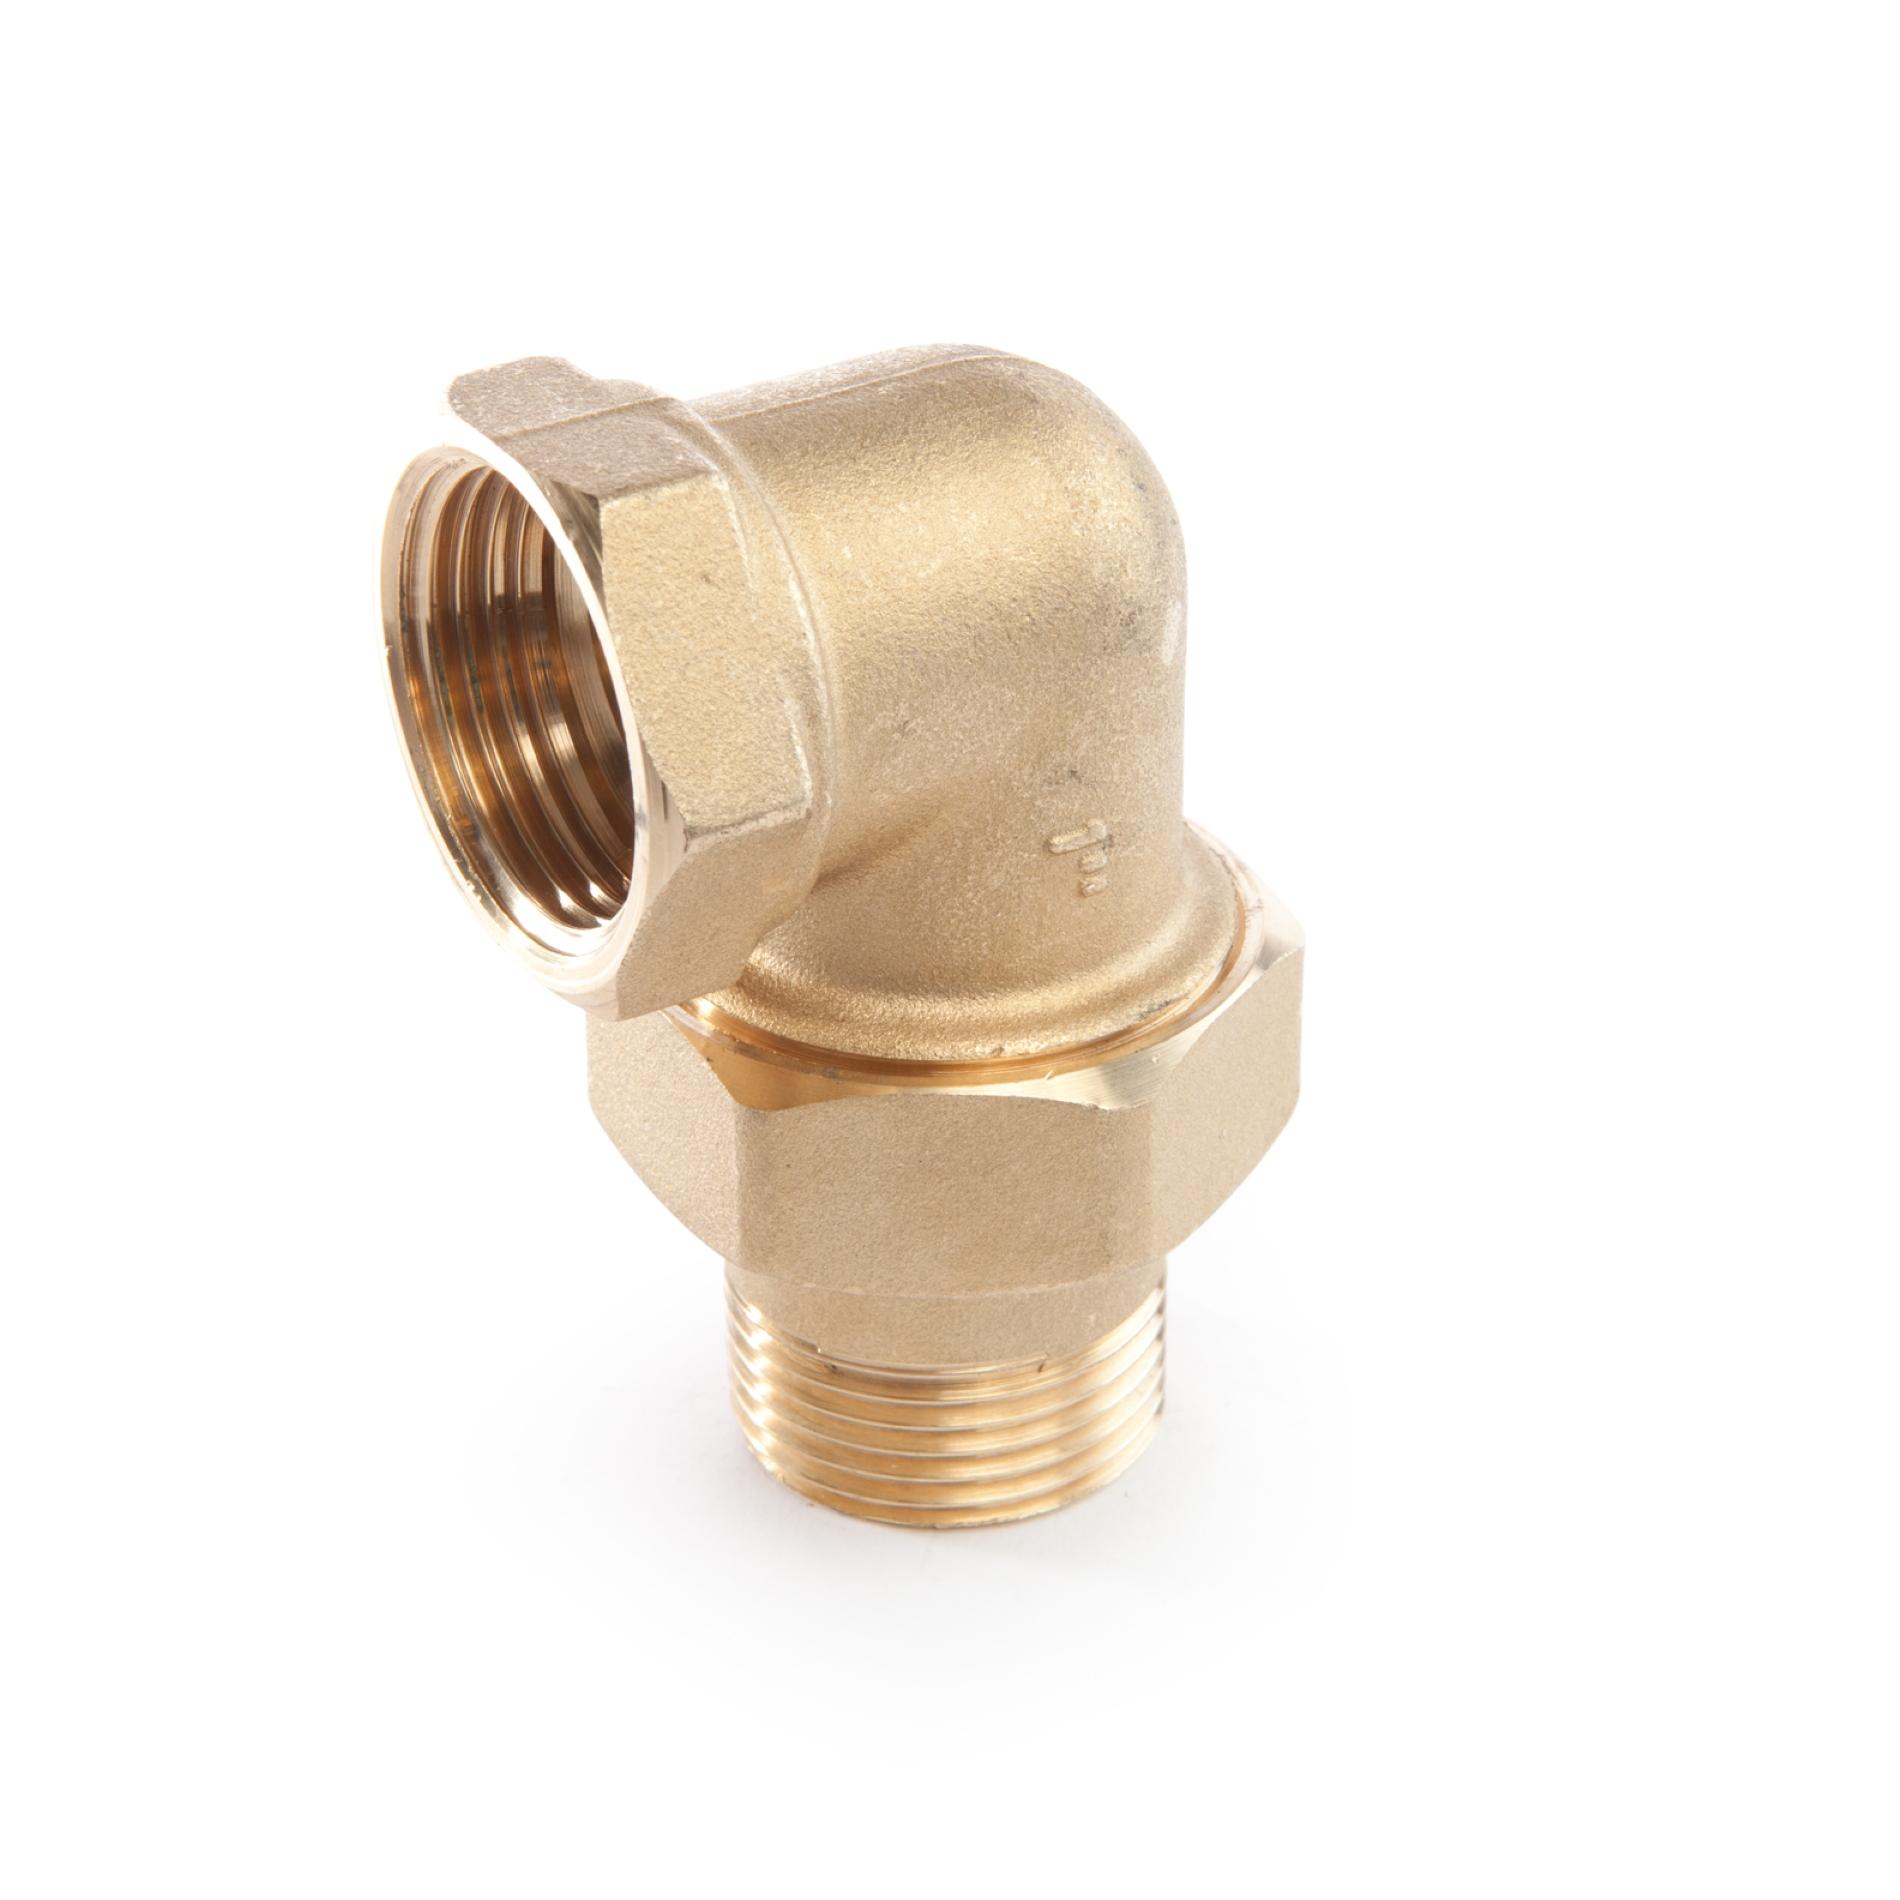 604 Raccordo curvo in tre pezzi MxF tenuta o-ring NBR Brass three-piece elbow MxF NBR o-ring rubber seal